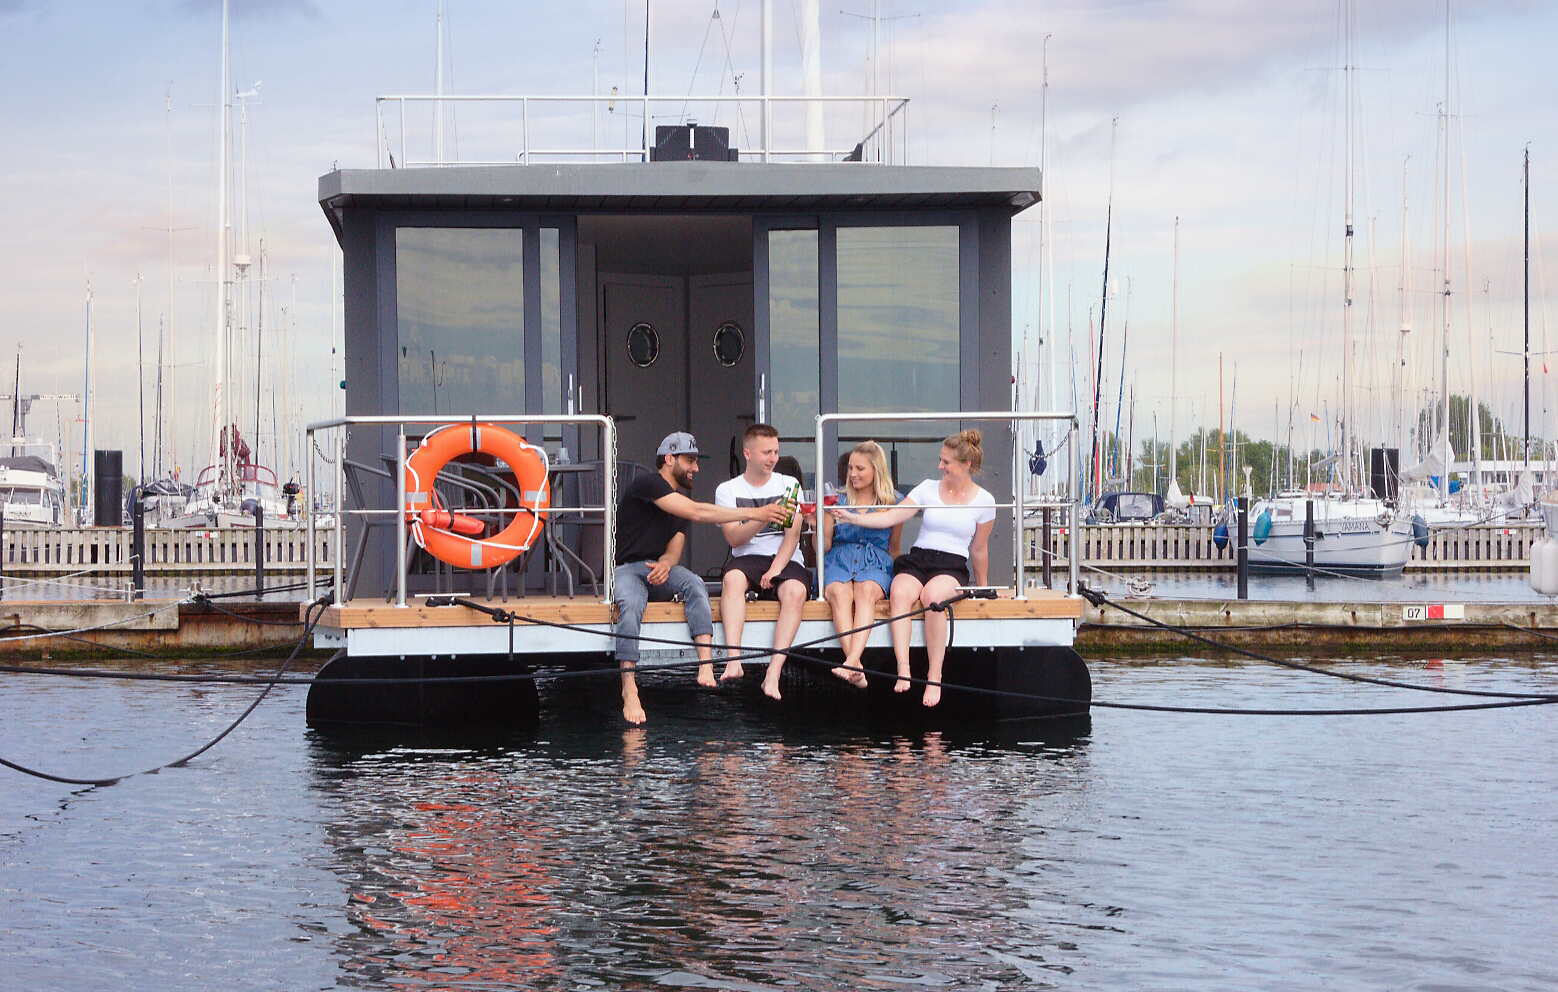 hausboot-kurzulaub-ohne-sauna-5-tage-4-uen-4-personen-bg4